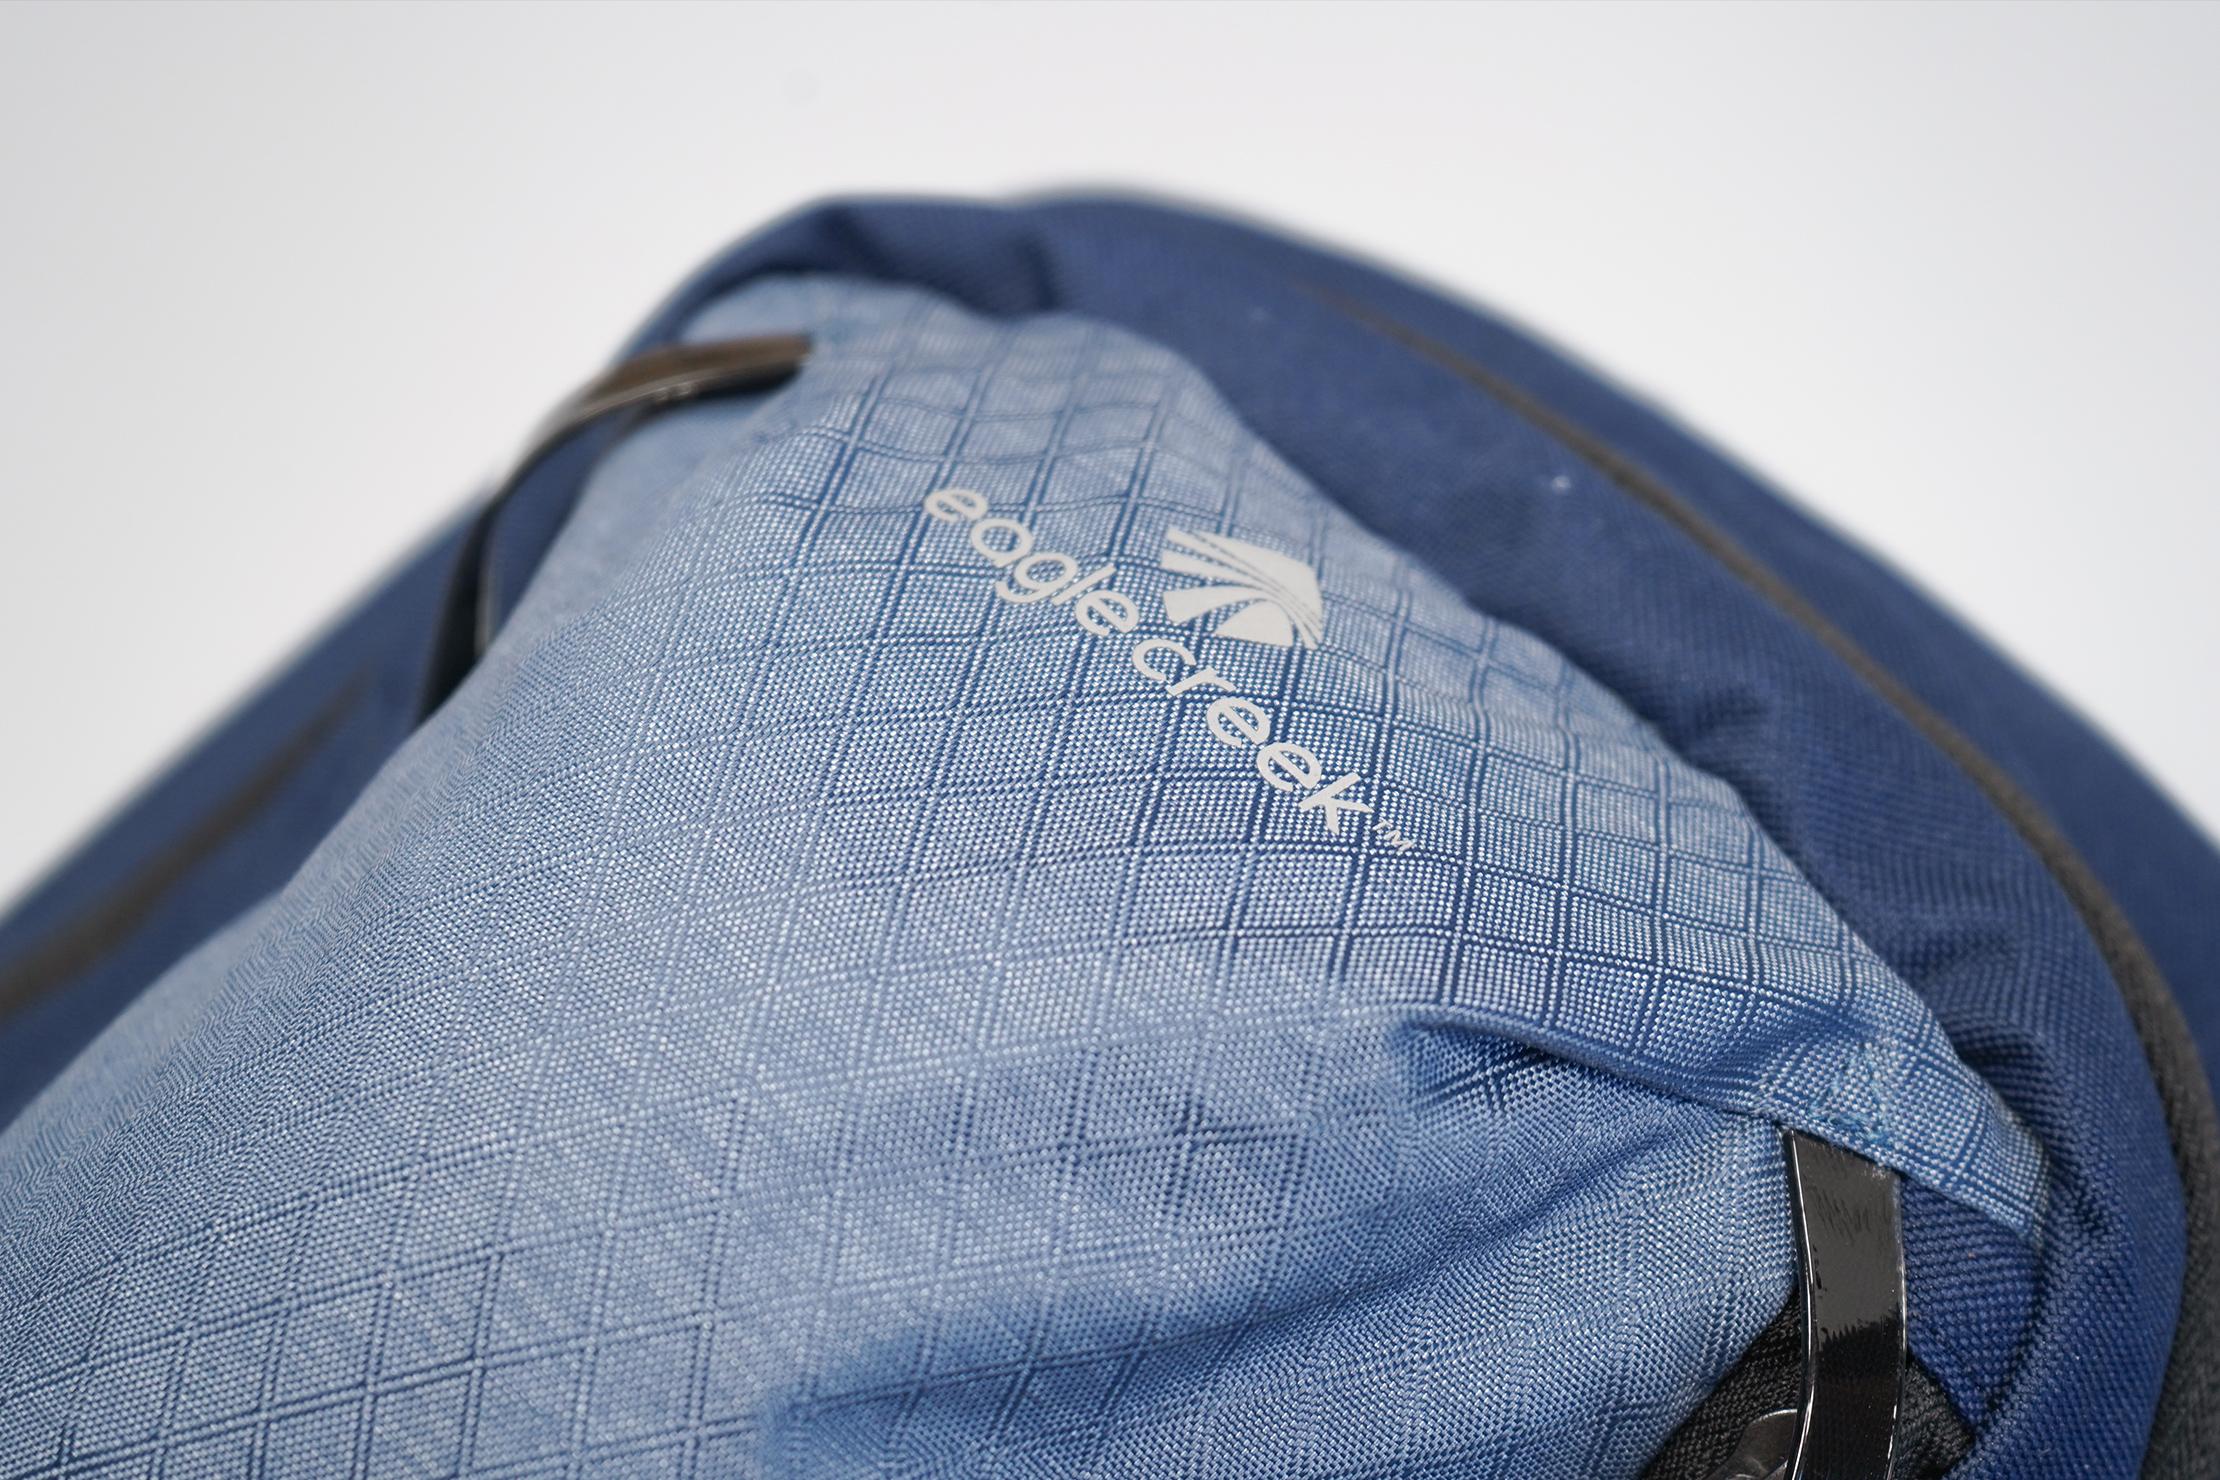 Eagle Creek Wayfinder Backpack Mini Material and Logo